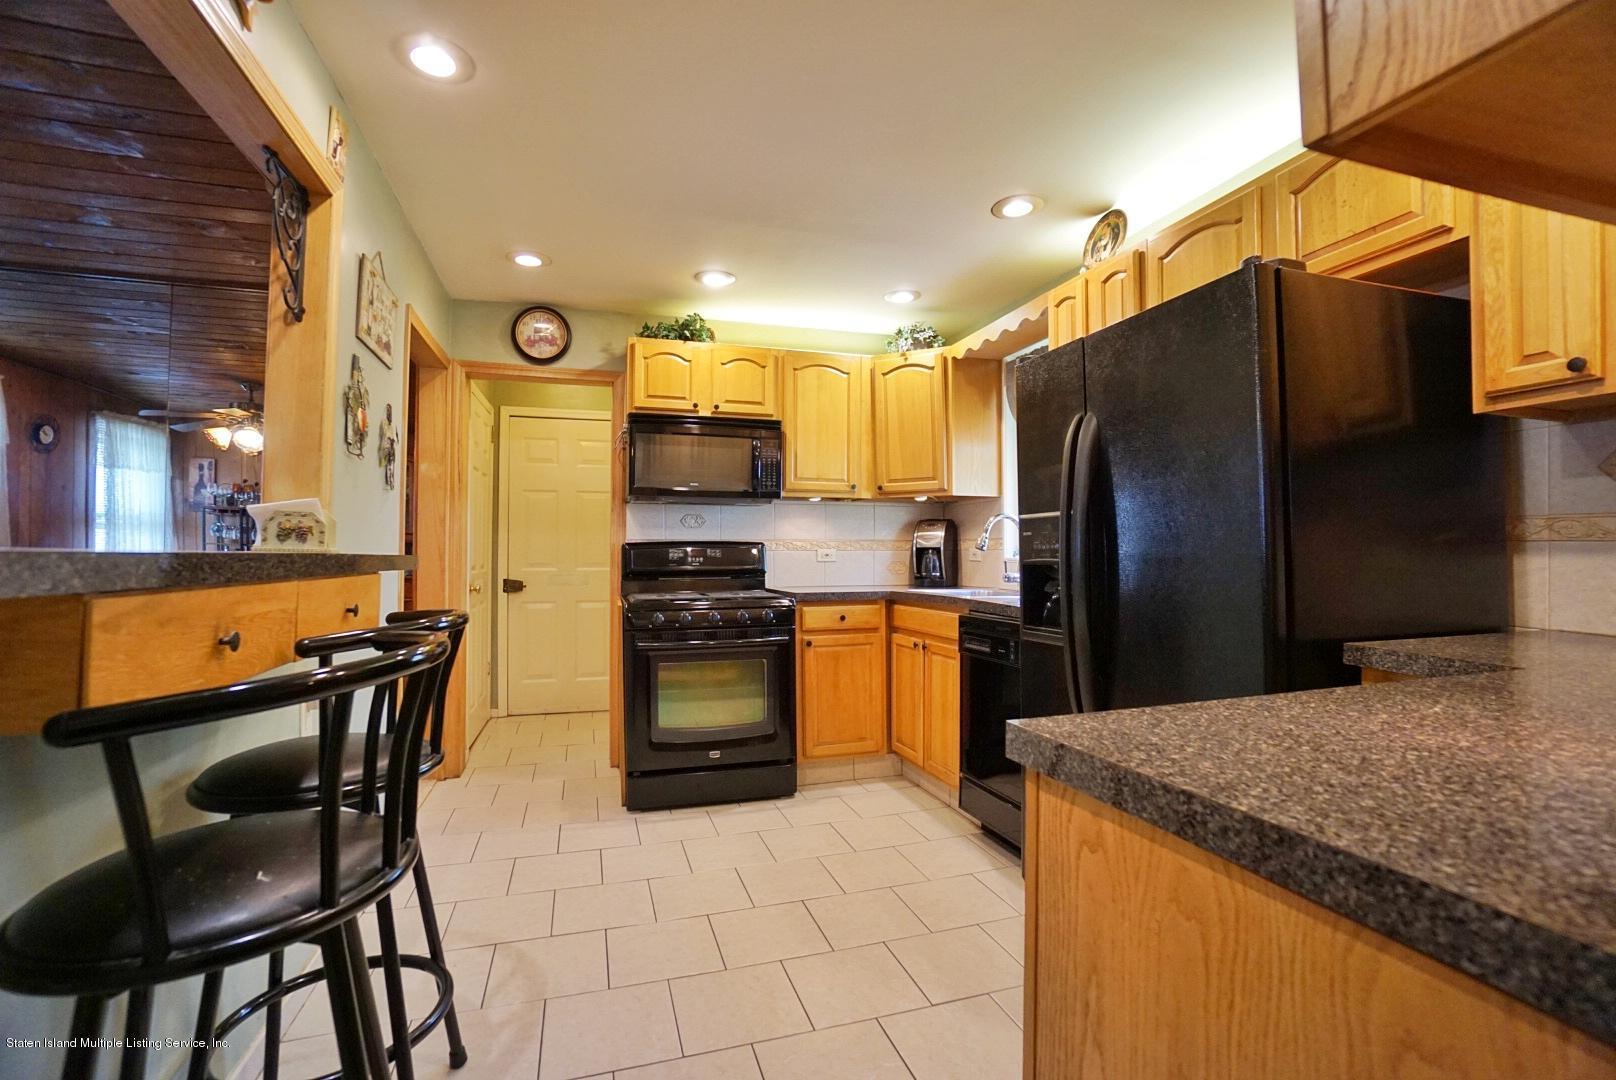 Single Family - Detached 42-44 Oceanic Avenue  Staten Island, NY 10312, MLS-1132674-6